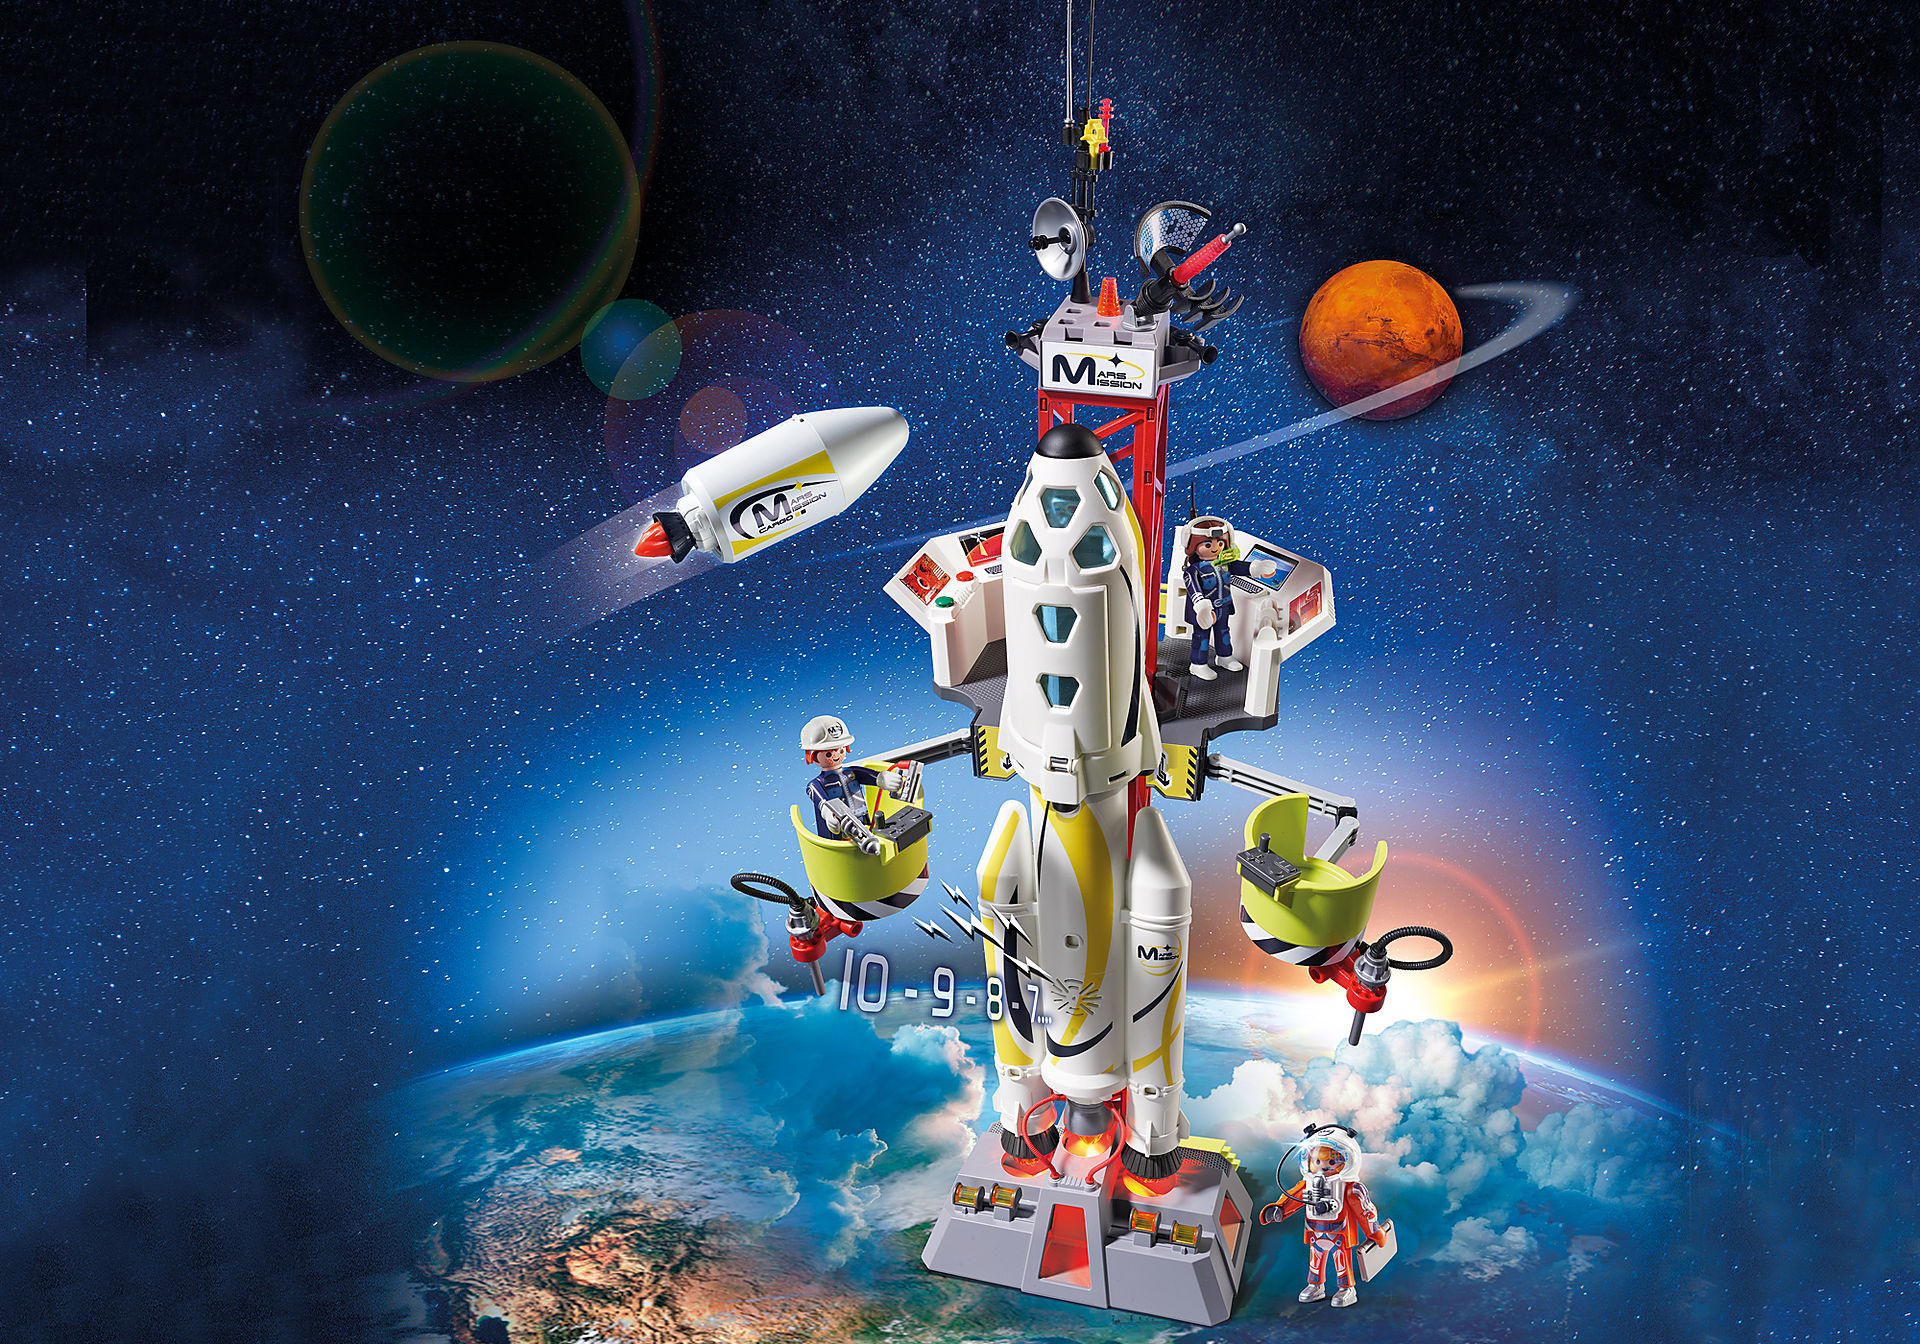 http://media.playmobil.com/i/playmobil/9488_product_detail/Rakieta kosmiczna z rampą startową